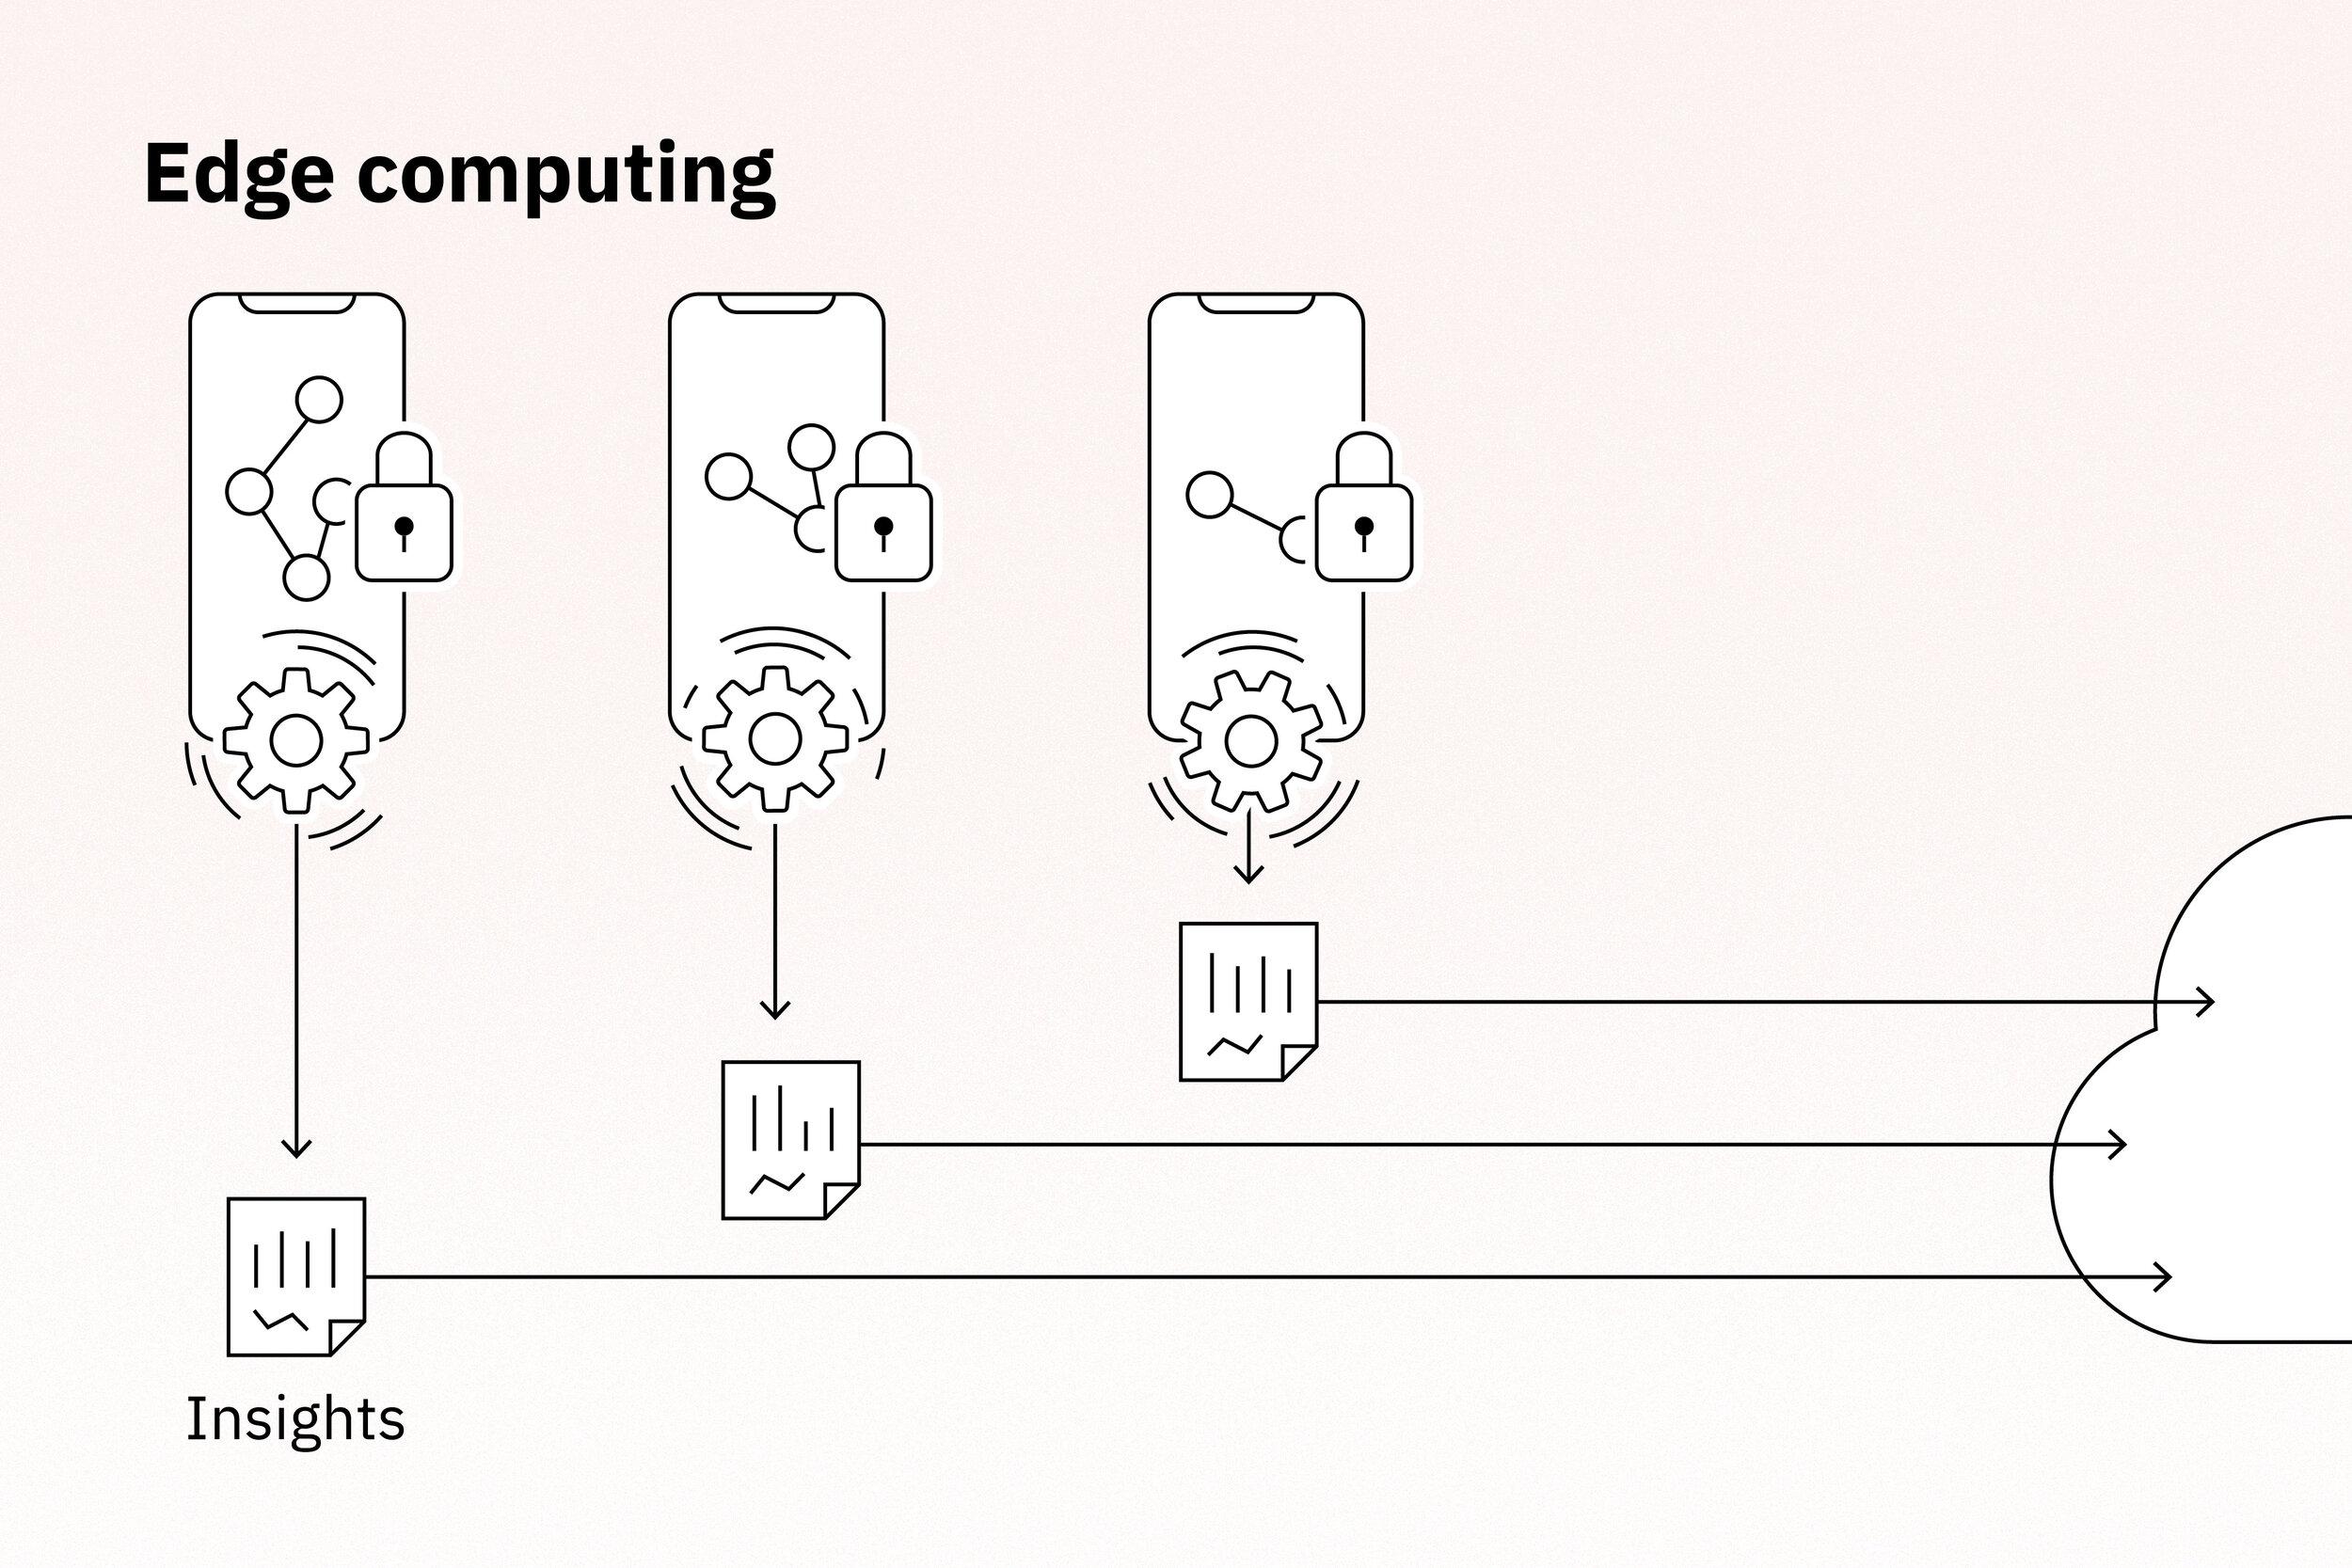 Edge computing illustration, detail